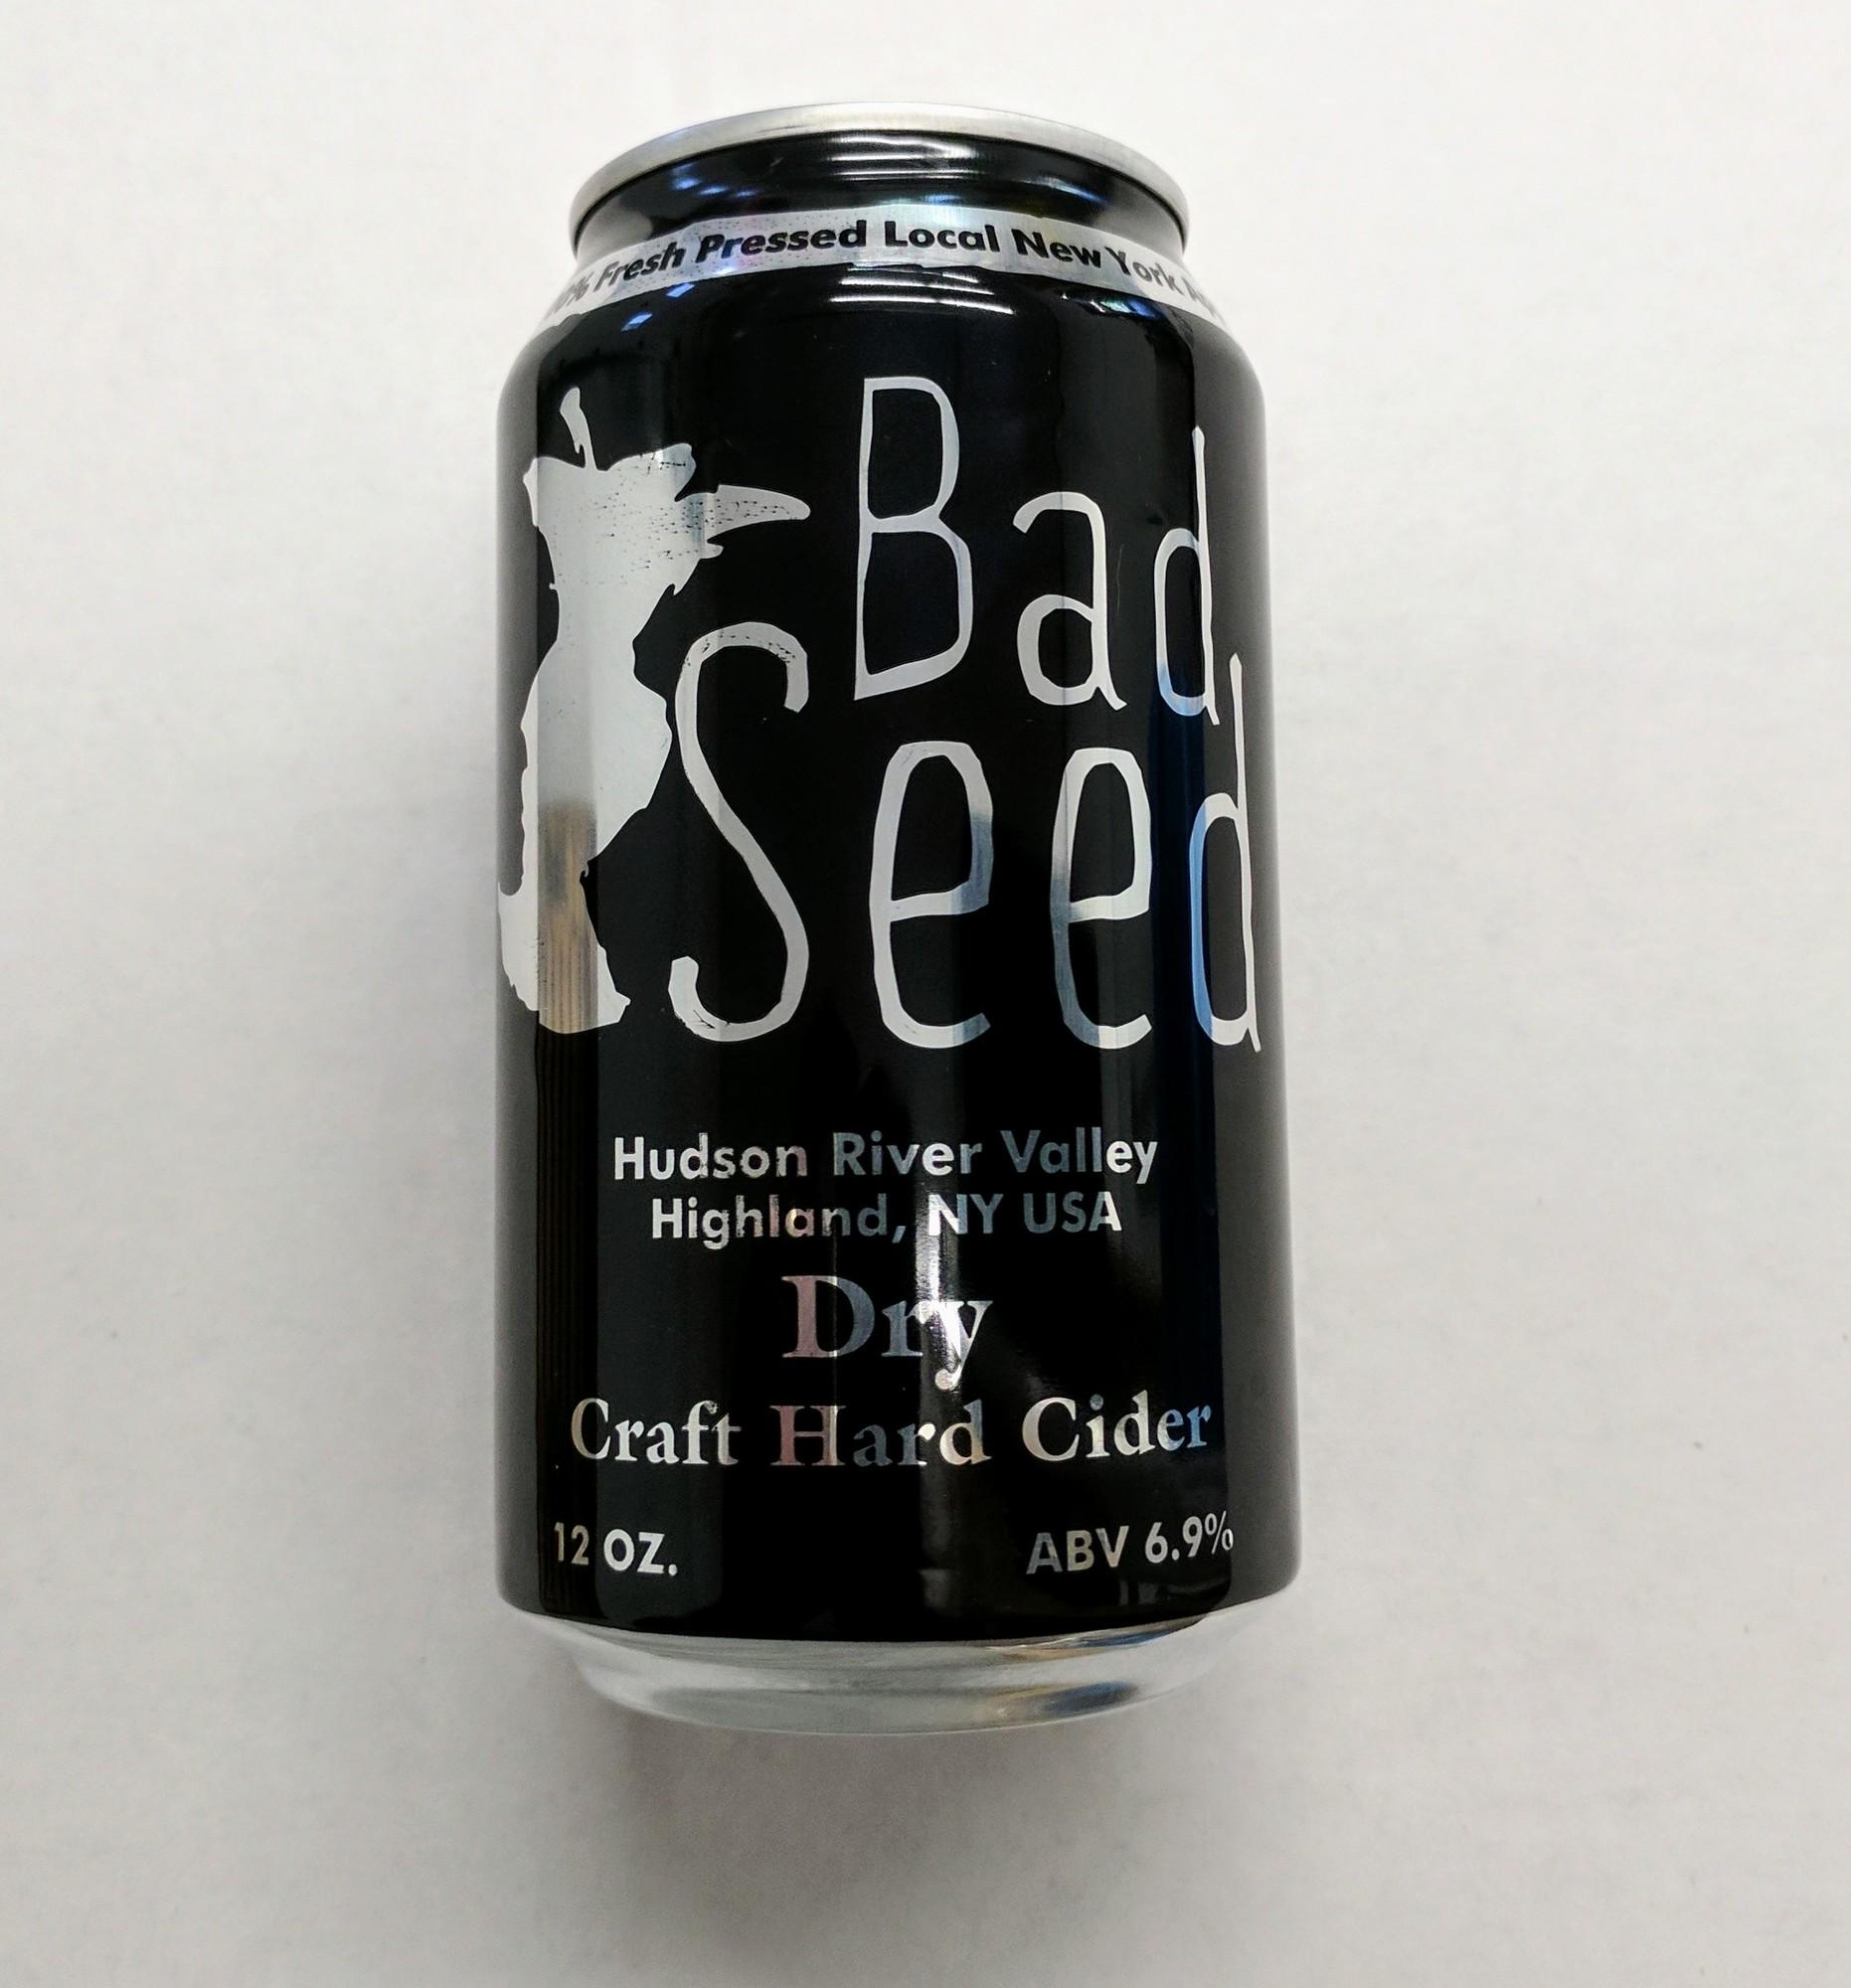 Bad Seed Dry Hard Cider beer Label Full Size